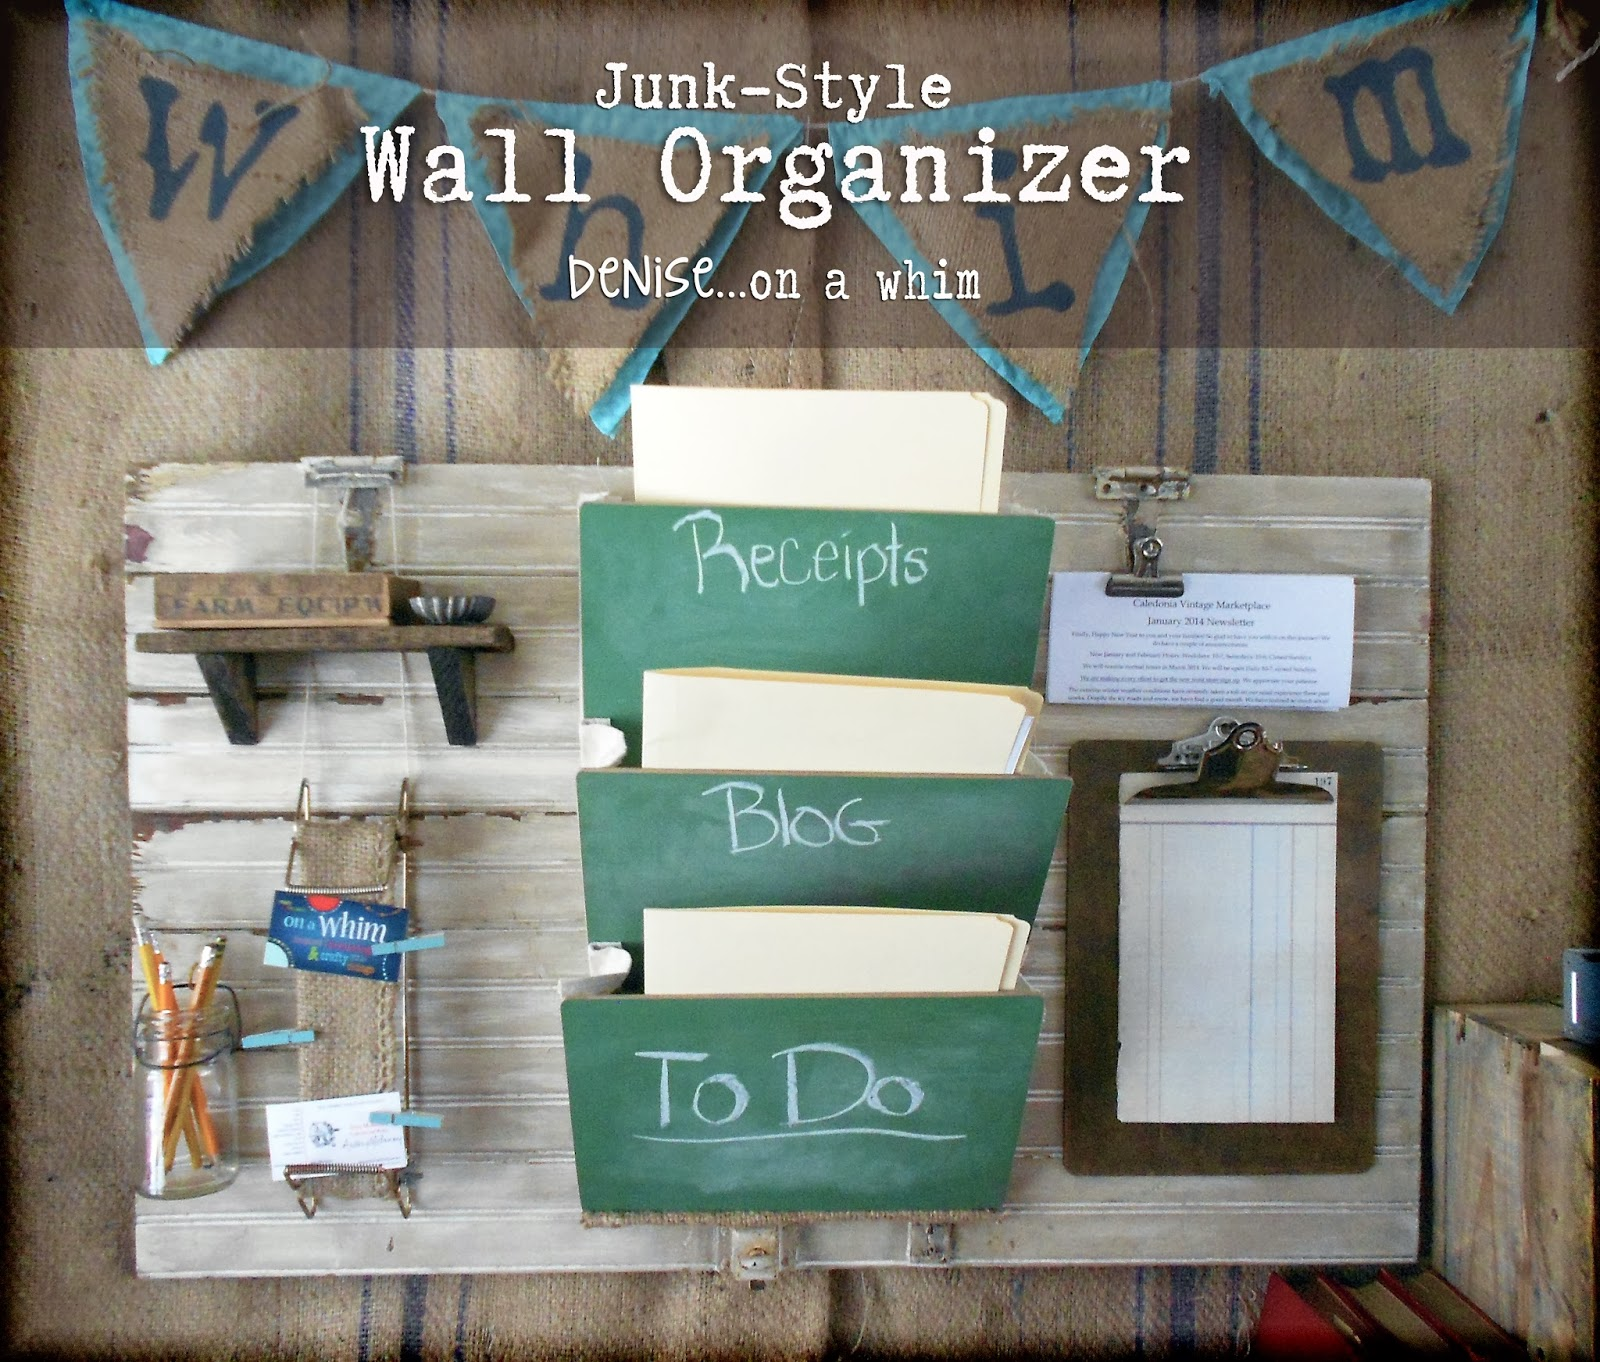 WallOrganizer21